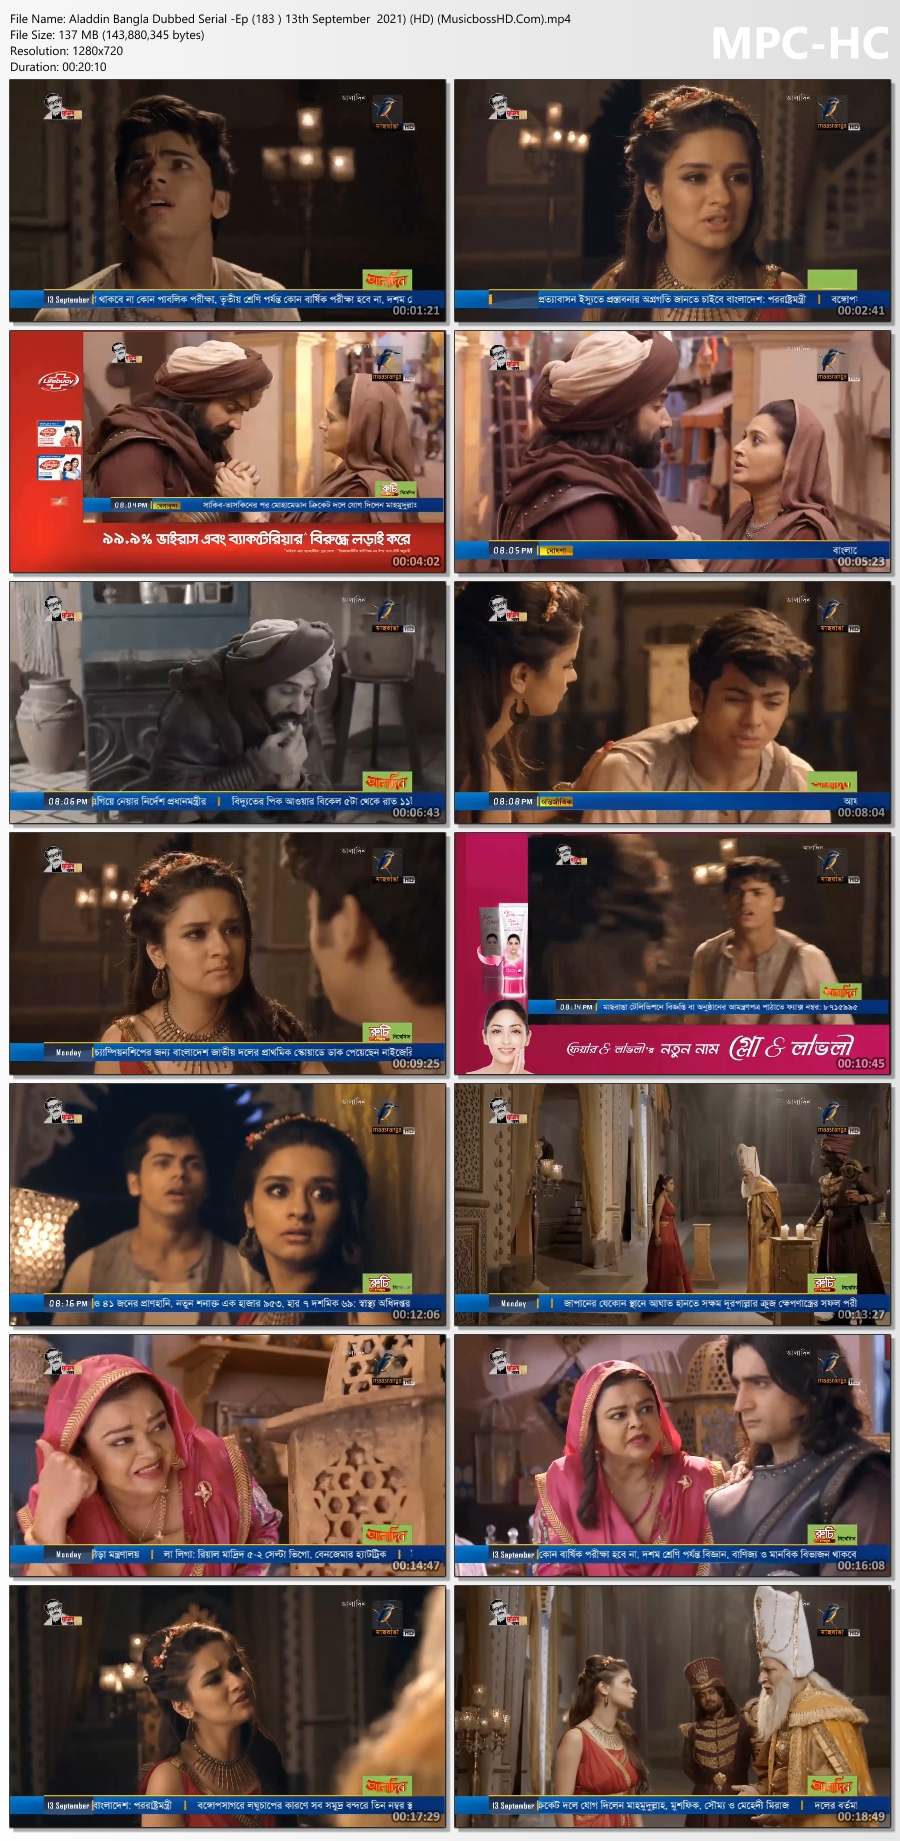 Aladdin-Bangla-Dubbed-Serial-Ep-183-13th-September-2021-HD-Musicboss-HD-Com-mp4-thumbs